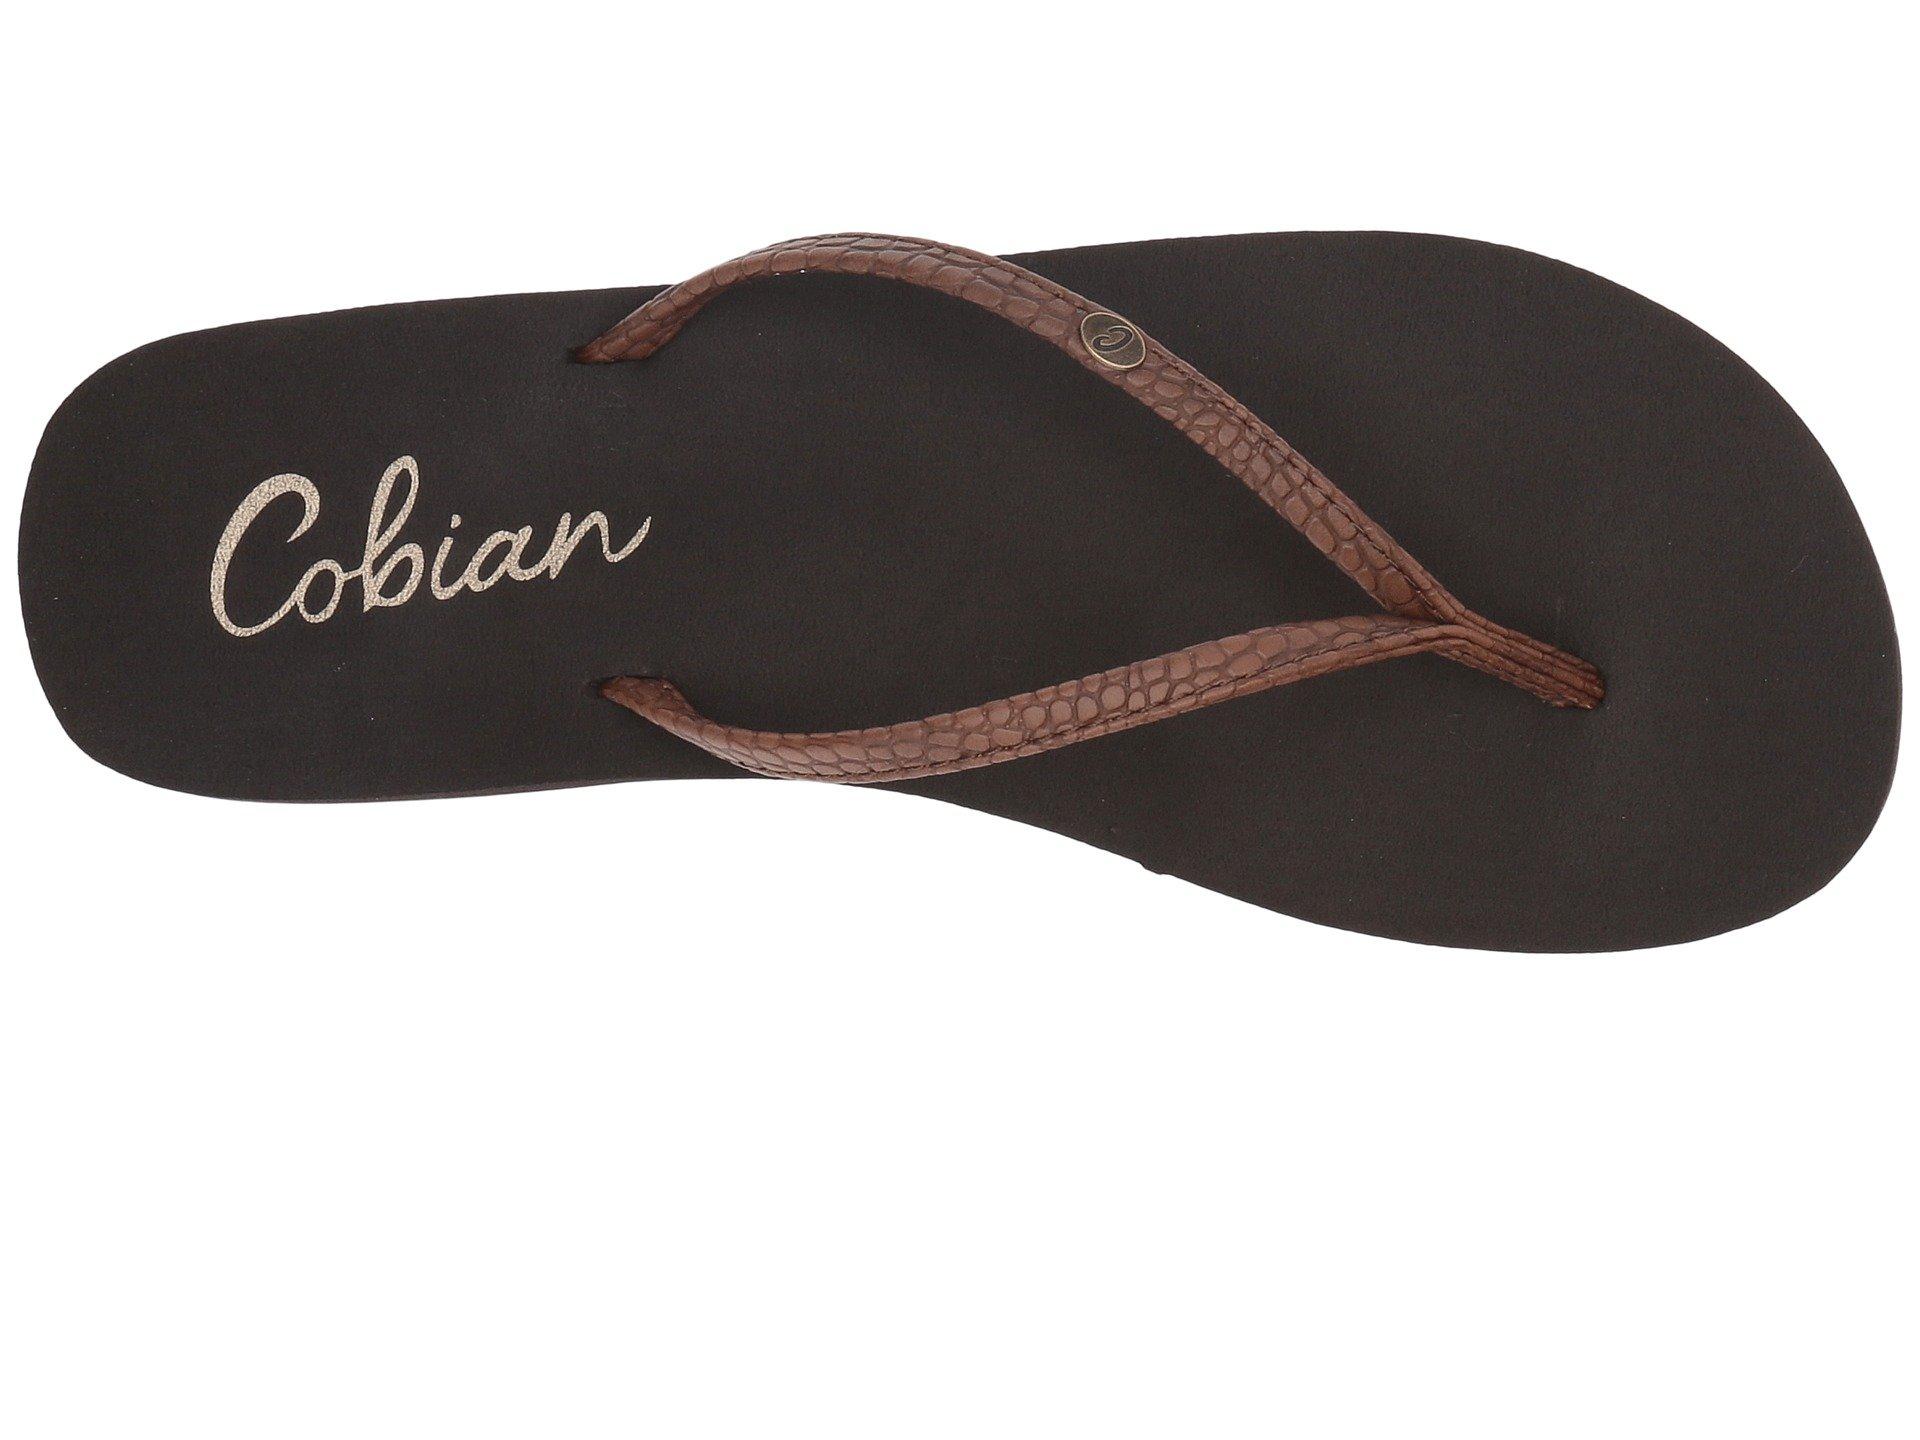 Bounce Cobian Bounce Chocolate Chocolate Nias Cobian Cobian Nias U7wBa